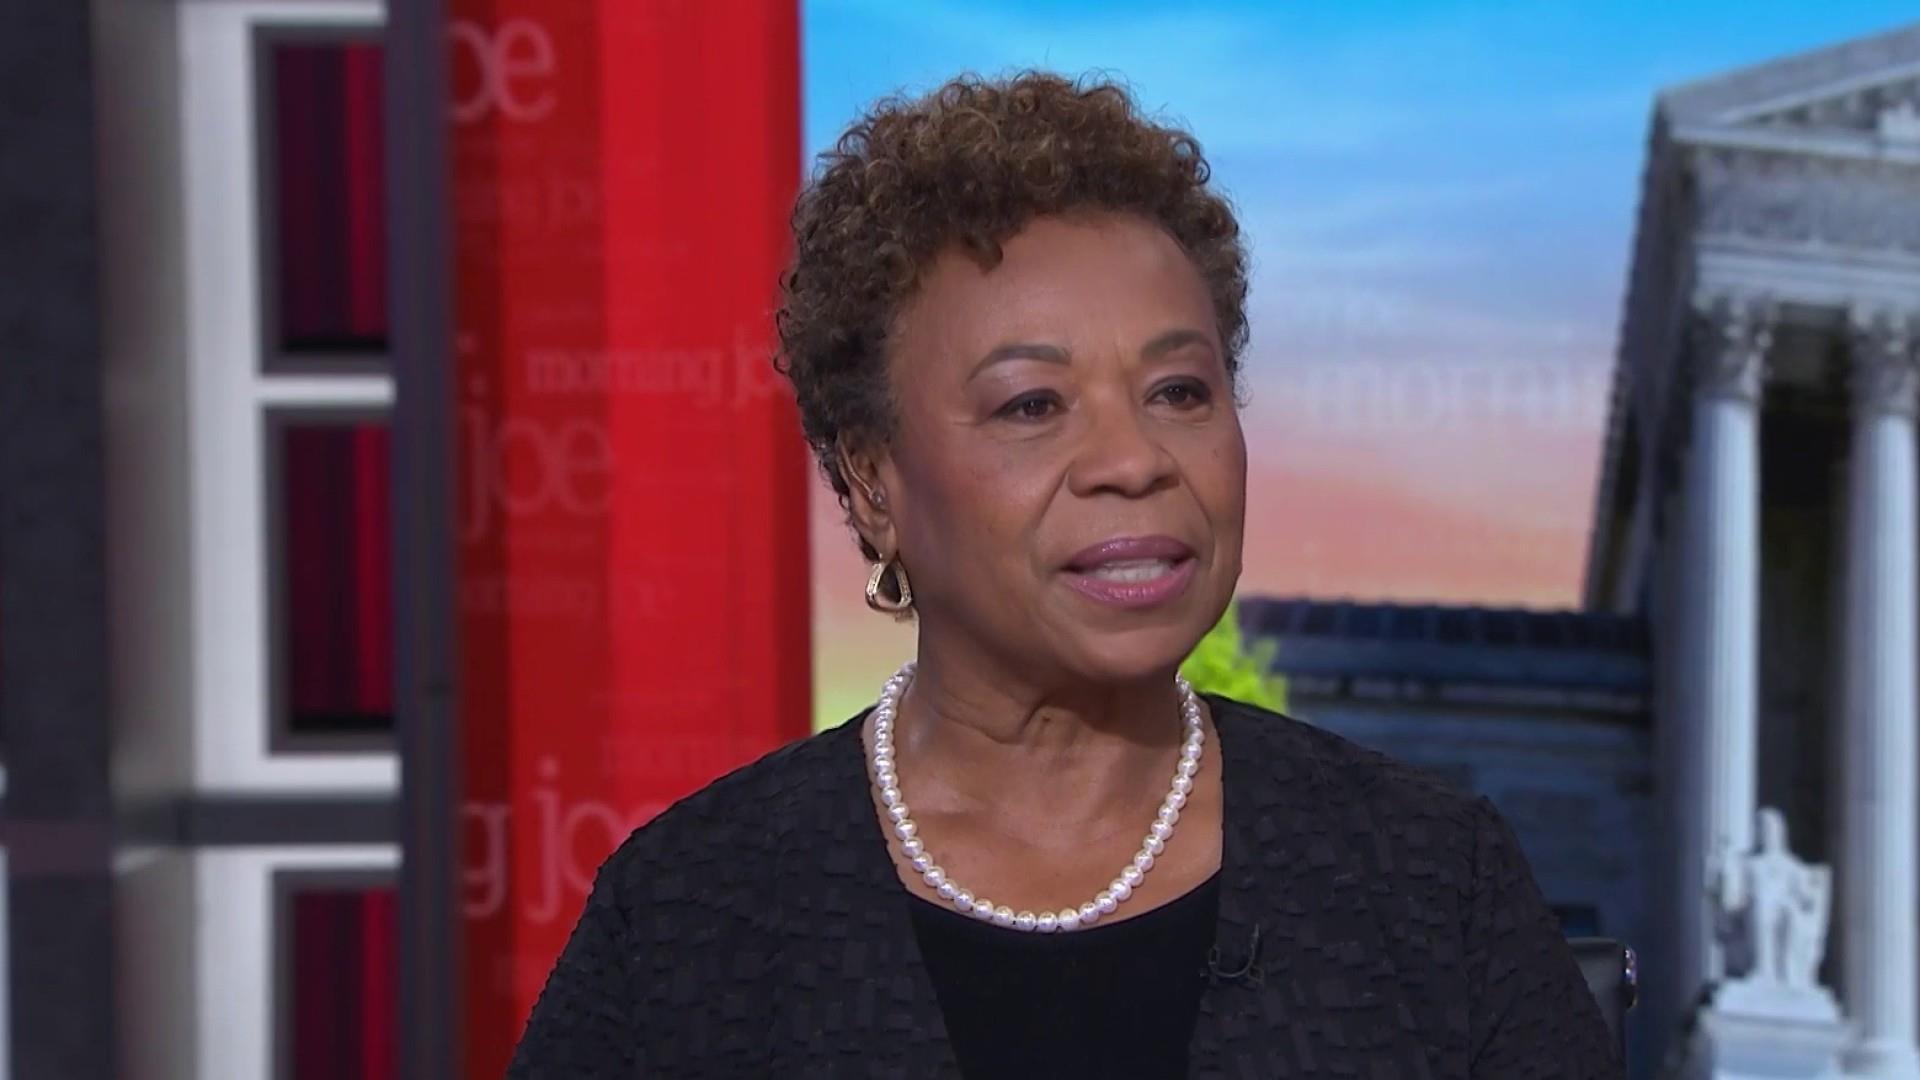 Congresswoman condemns Trump's 'dangerous' remarks